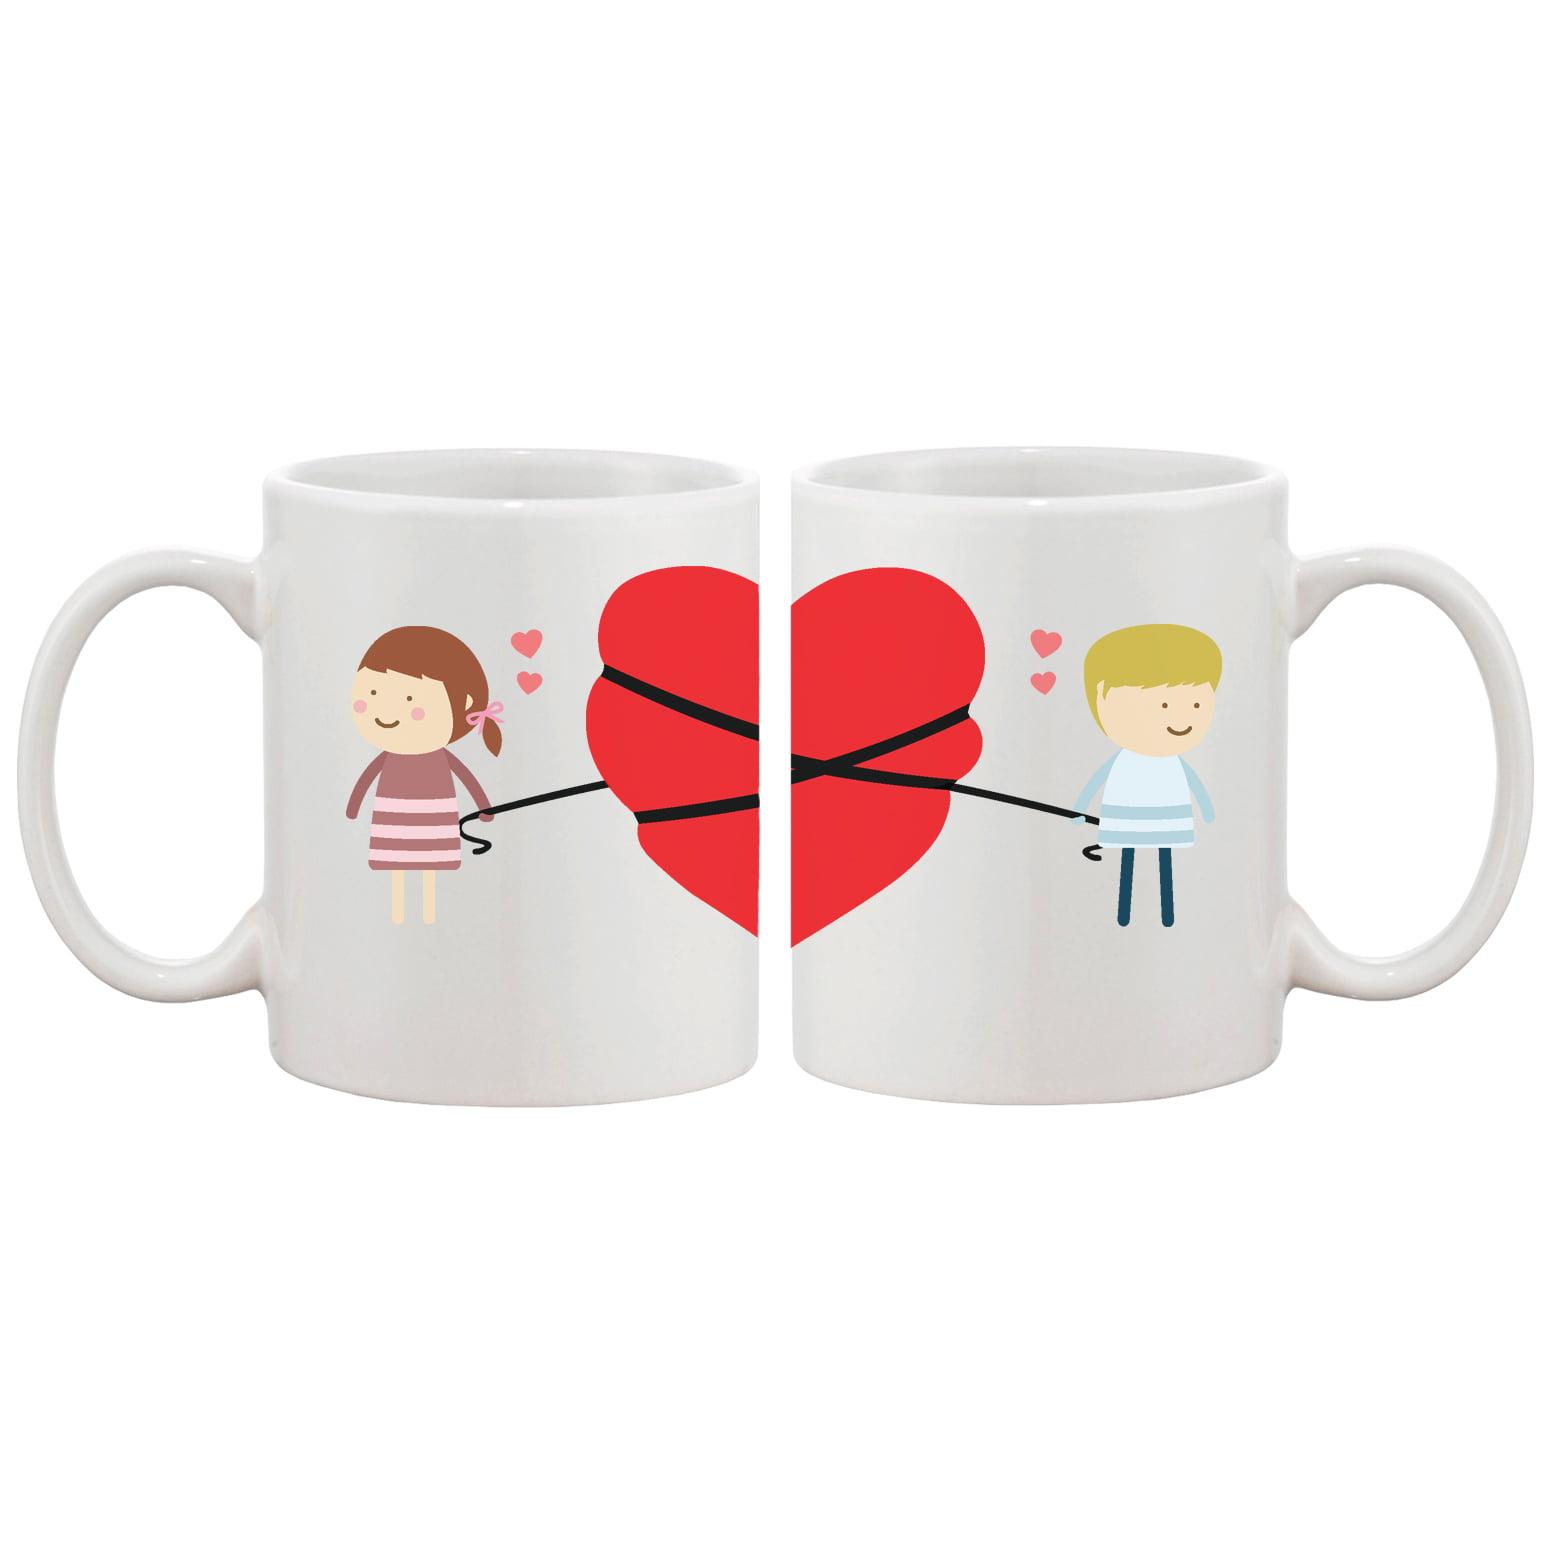 Love Connecting Couple Mugs Cute Graphic Design Ceramic Coffee Mug Cup 11 Oz Walmart Com Walmart Com